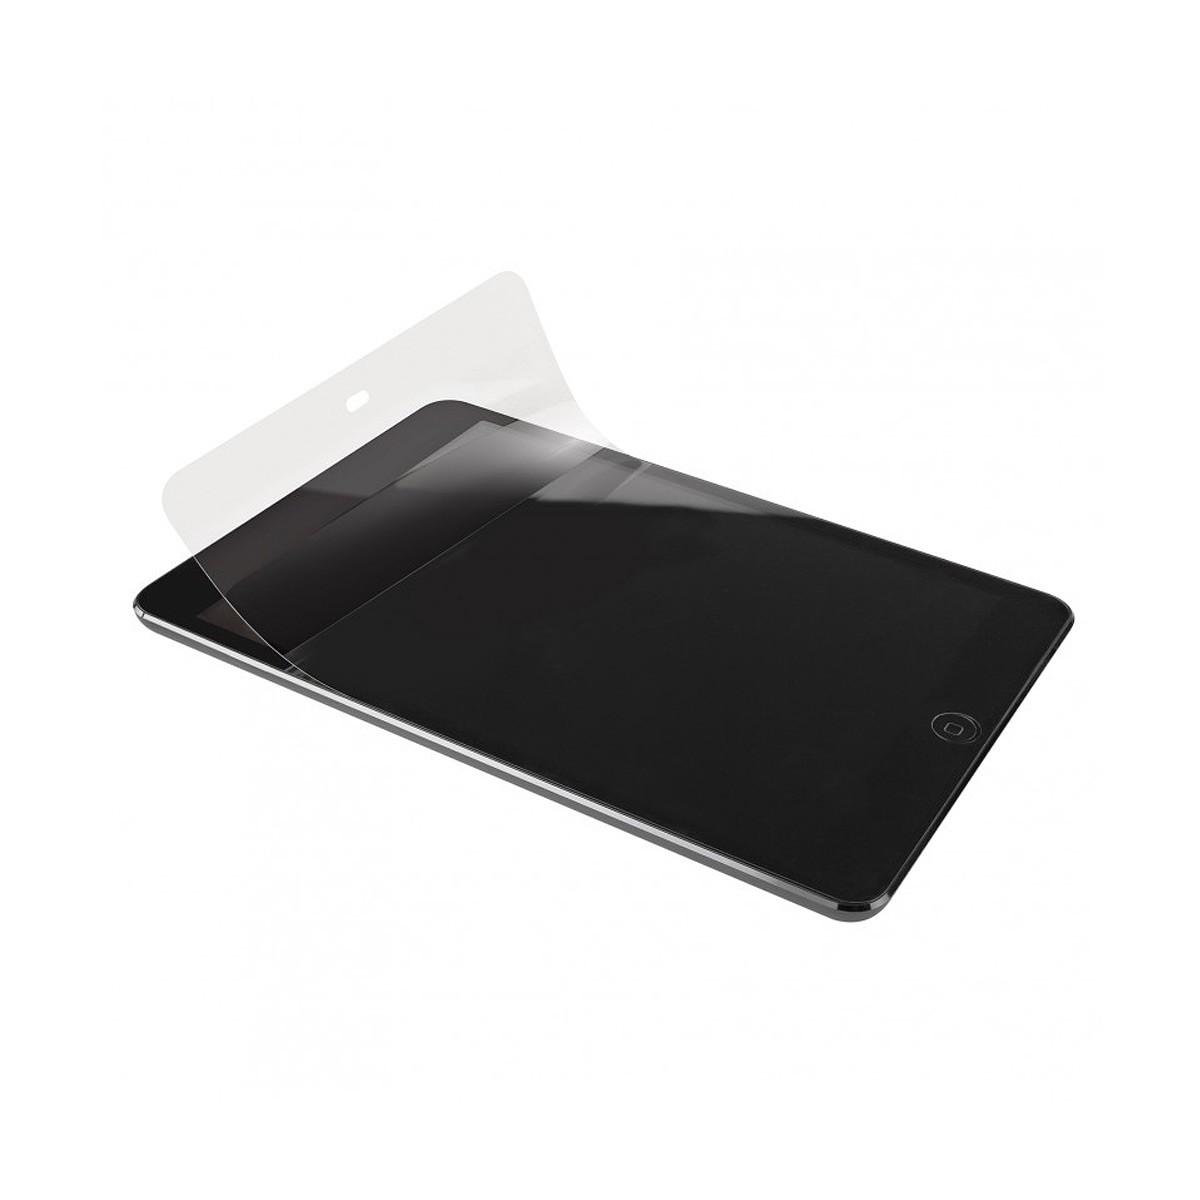 Artwizz ScratchStopper Anti-Fingerprint for iPad Mini - MATT